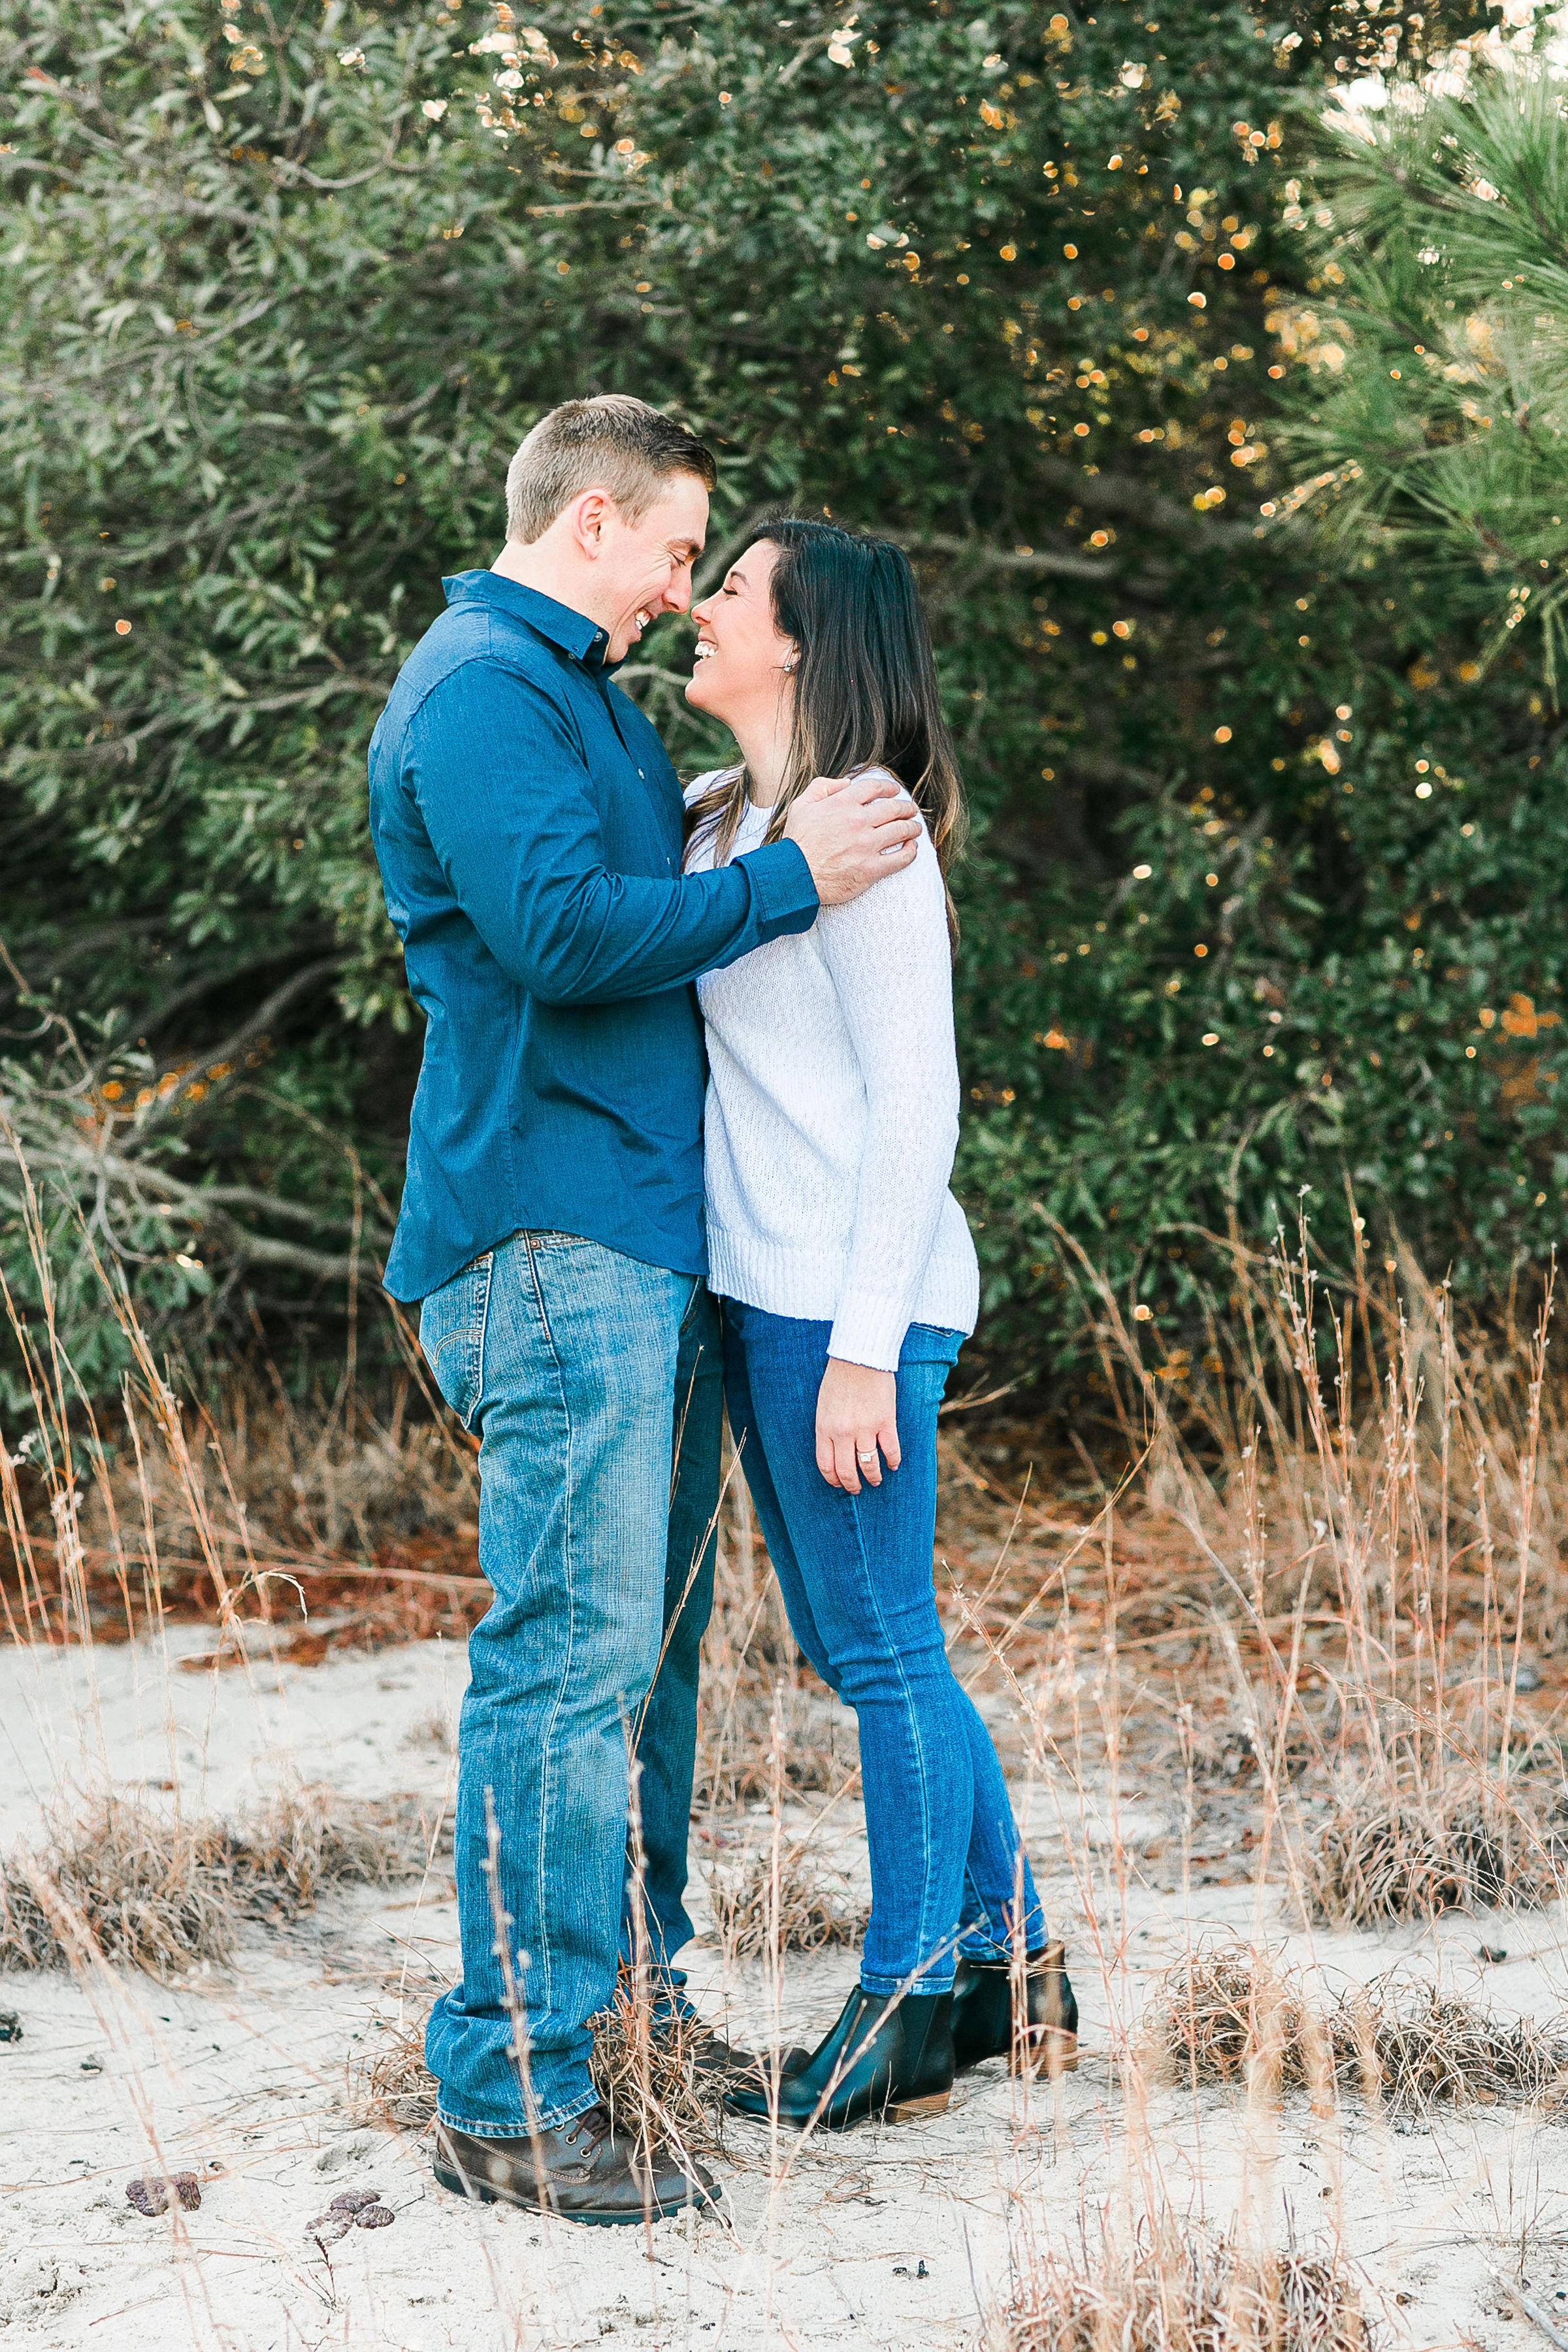 Nicole&Dustin_Engaged-77.jpg